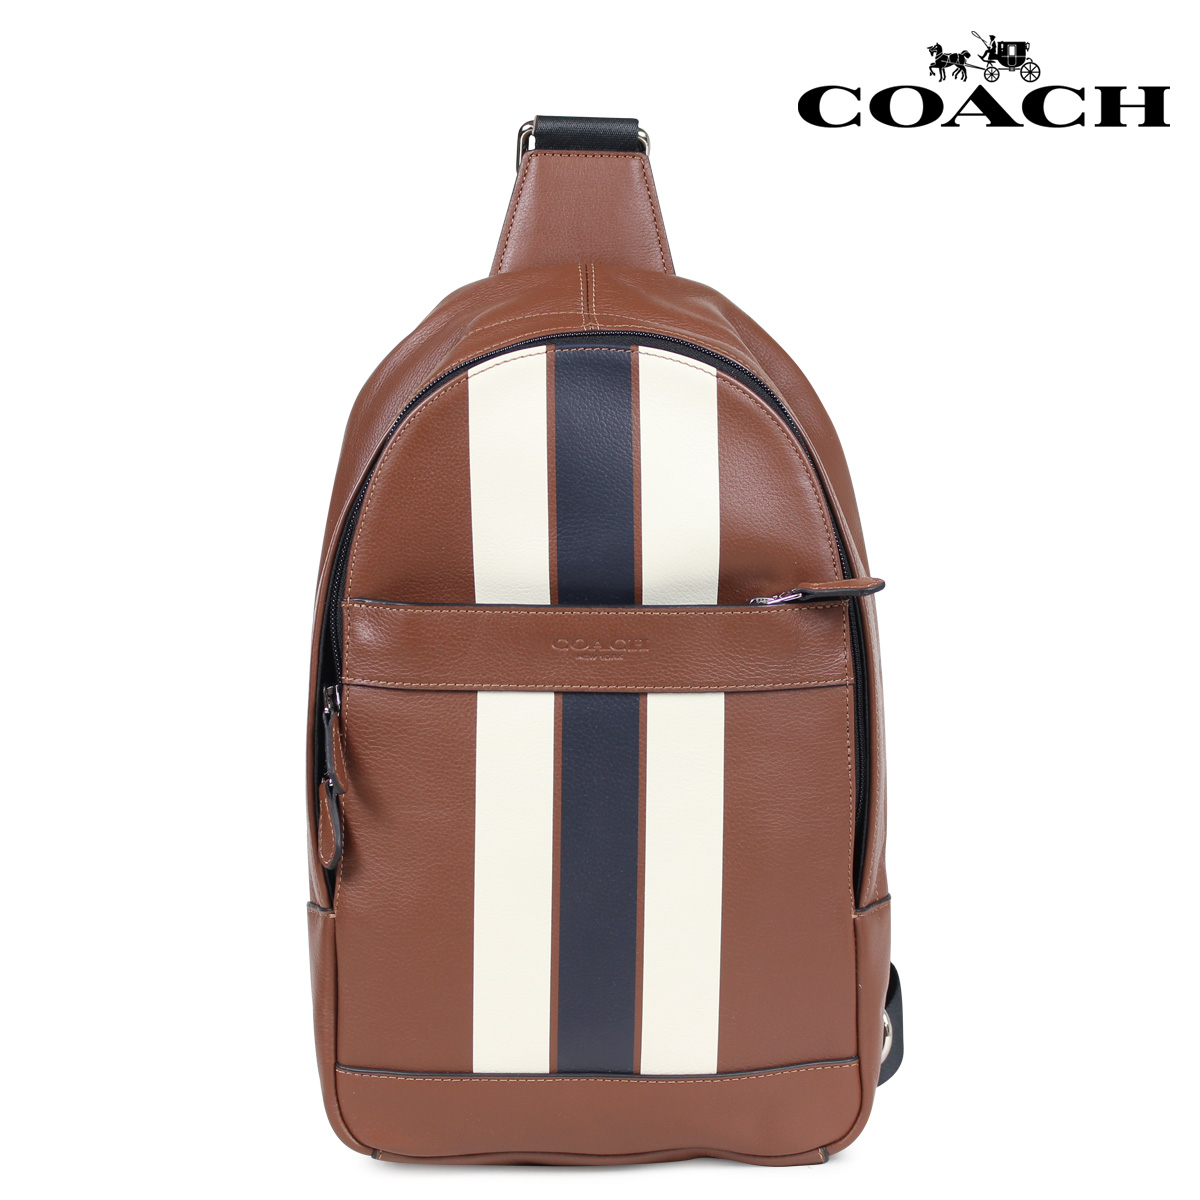 Coach Bag Shoulder Body Men Leather Brown F72226 5 11 Shinnyu Load